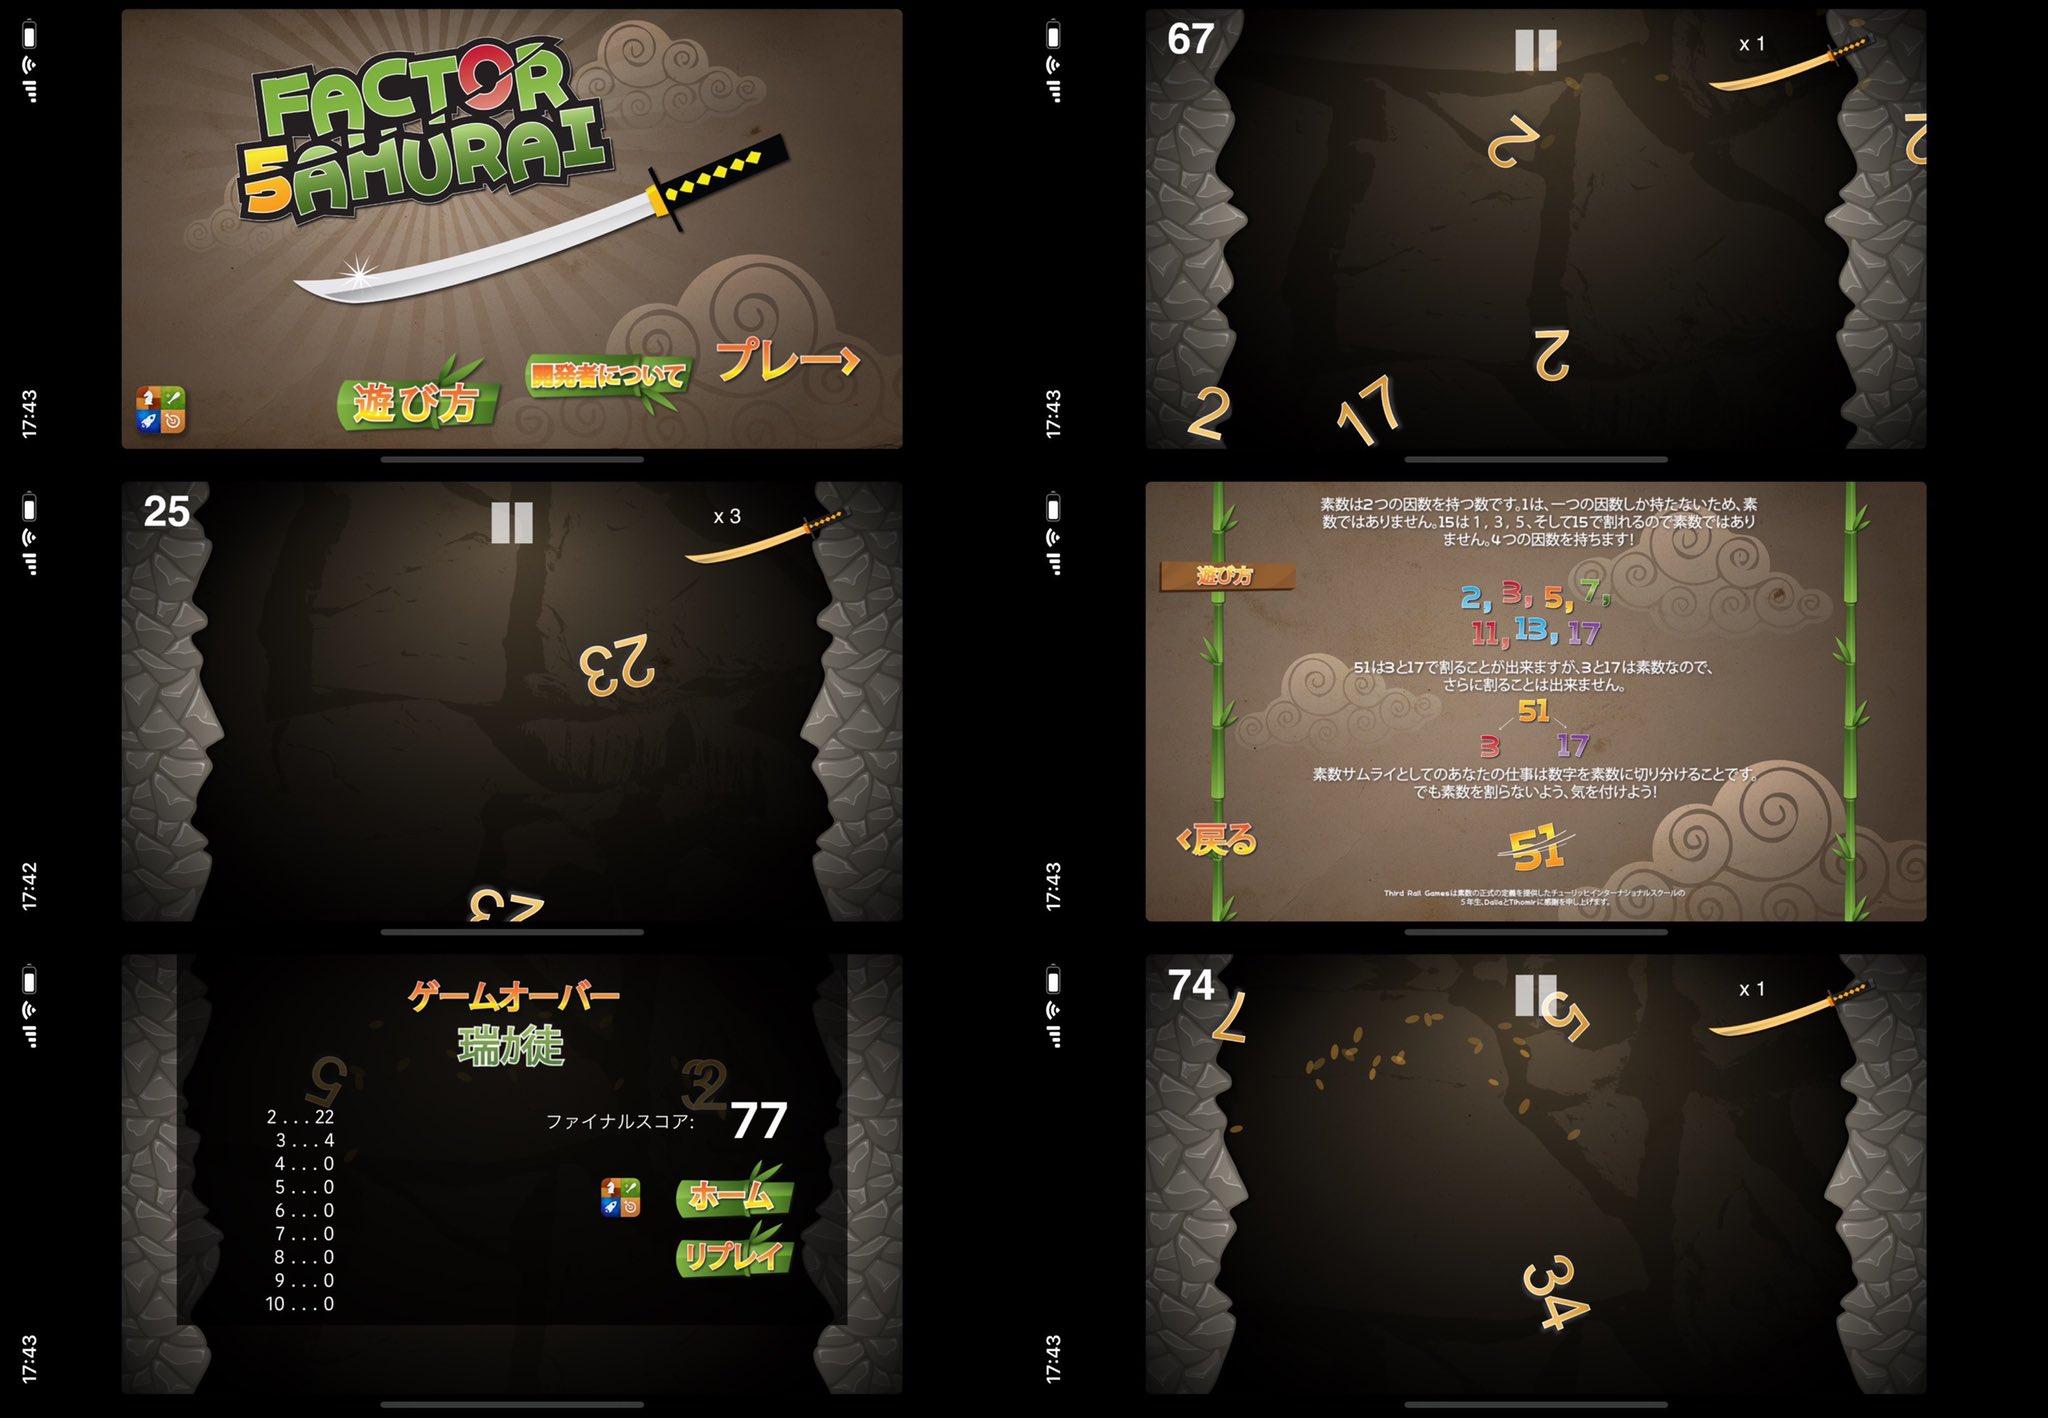 Factor Samrai 刀で素因数分解するゲーム。素数を切ってはいけない。 https://t.co/D771rr9hWJ